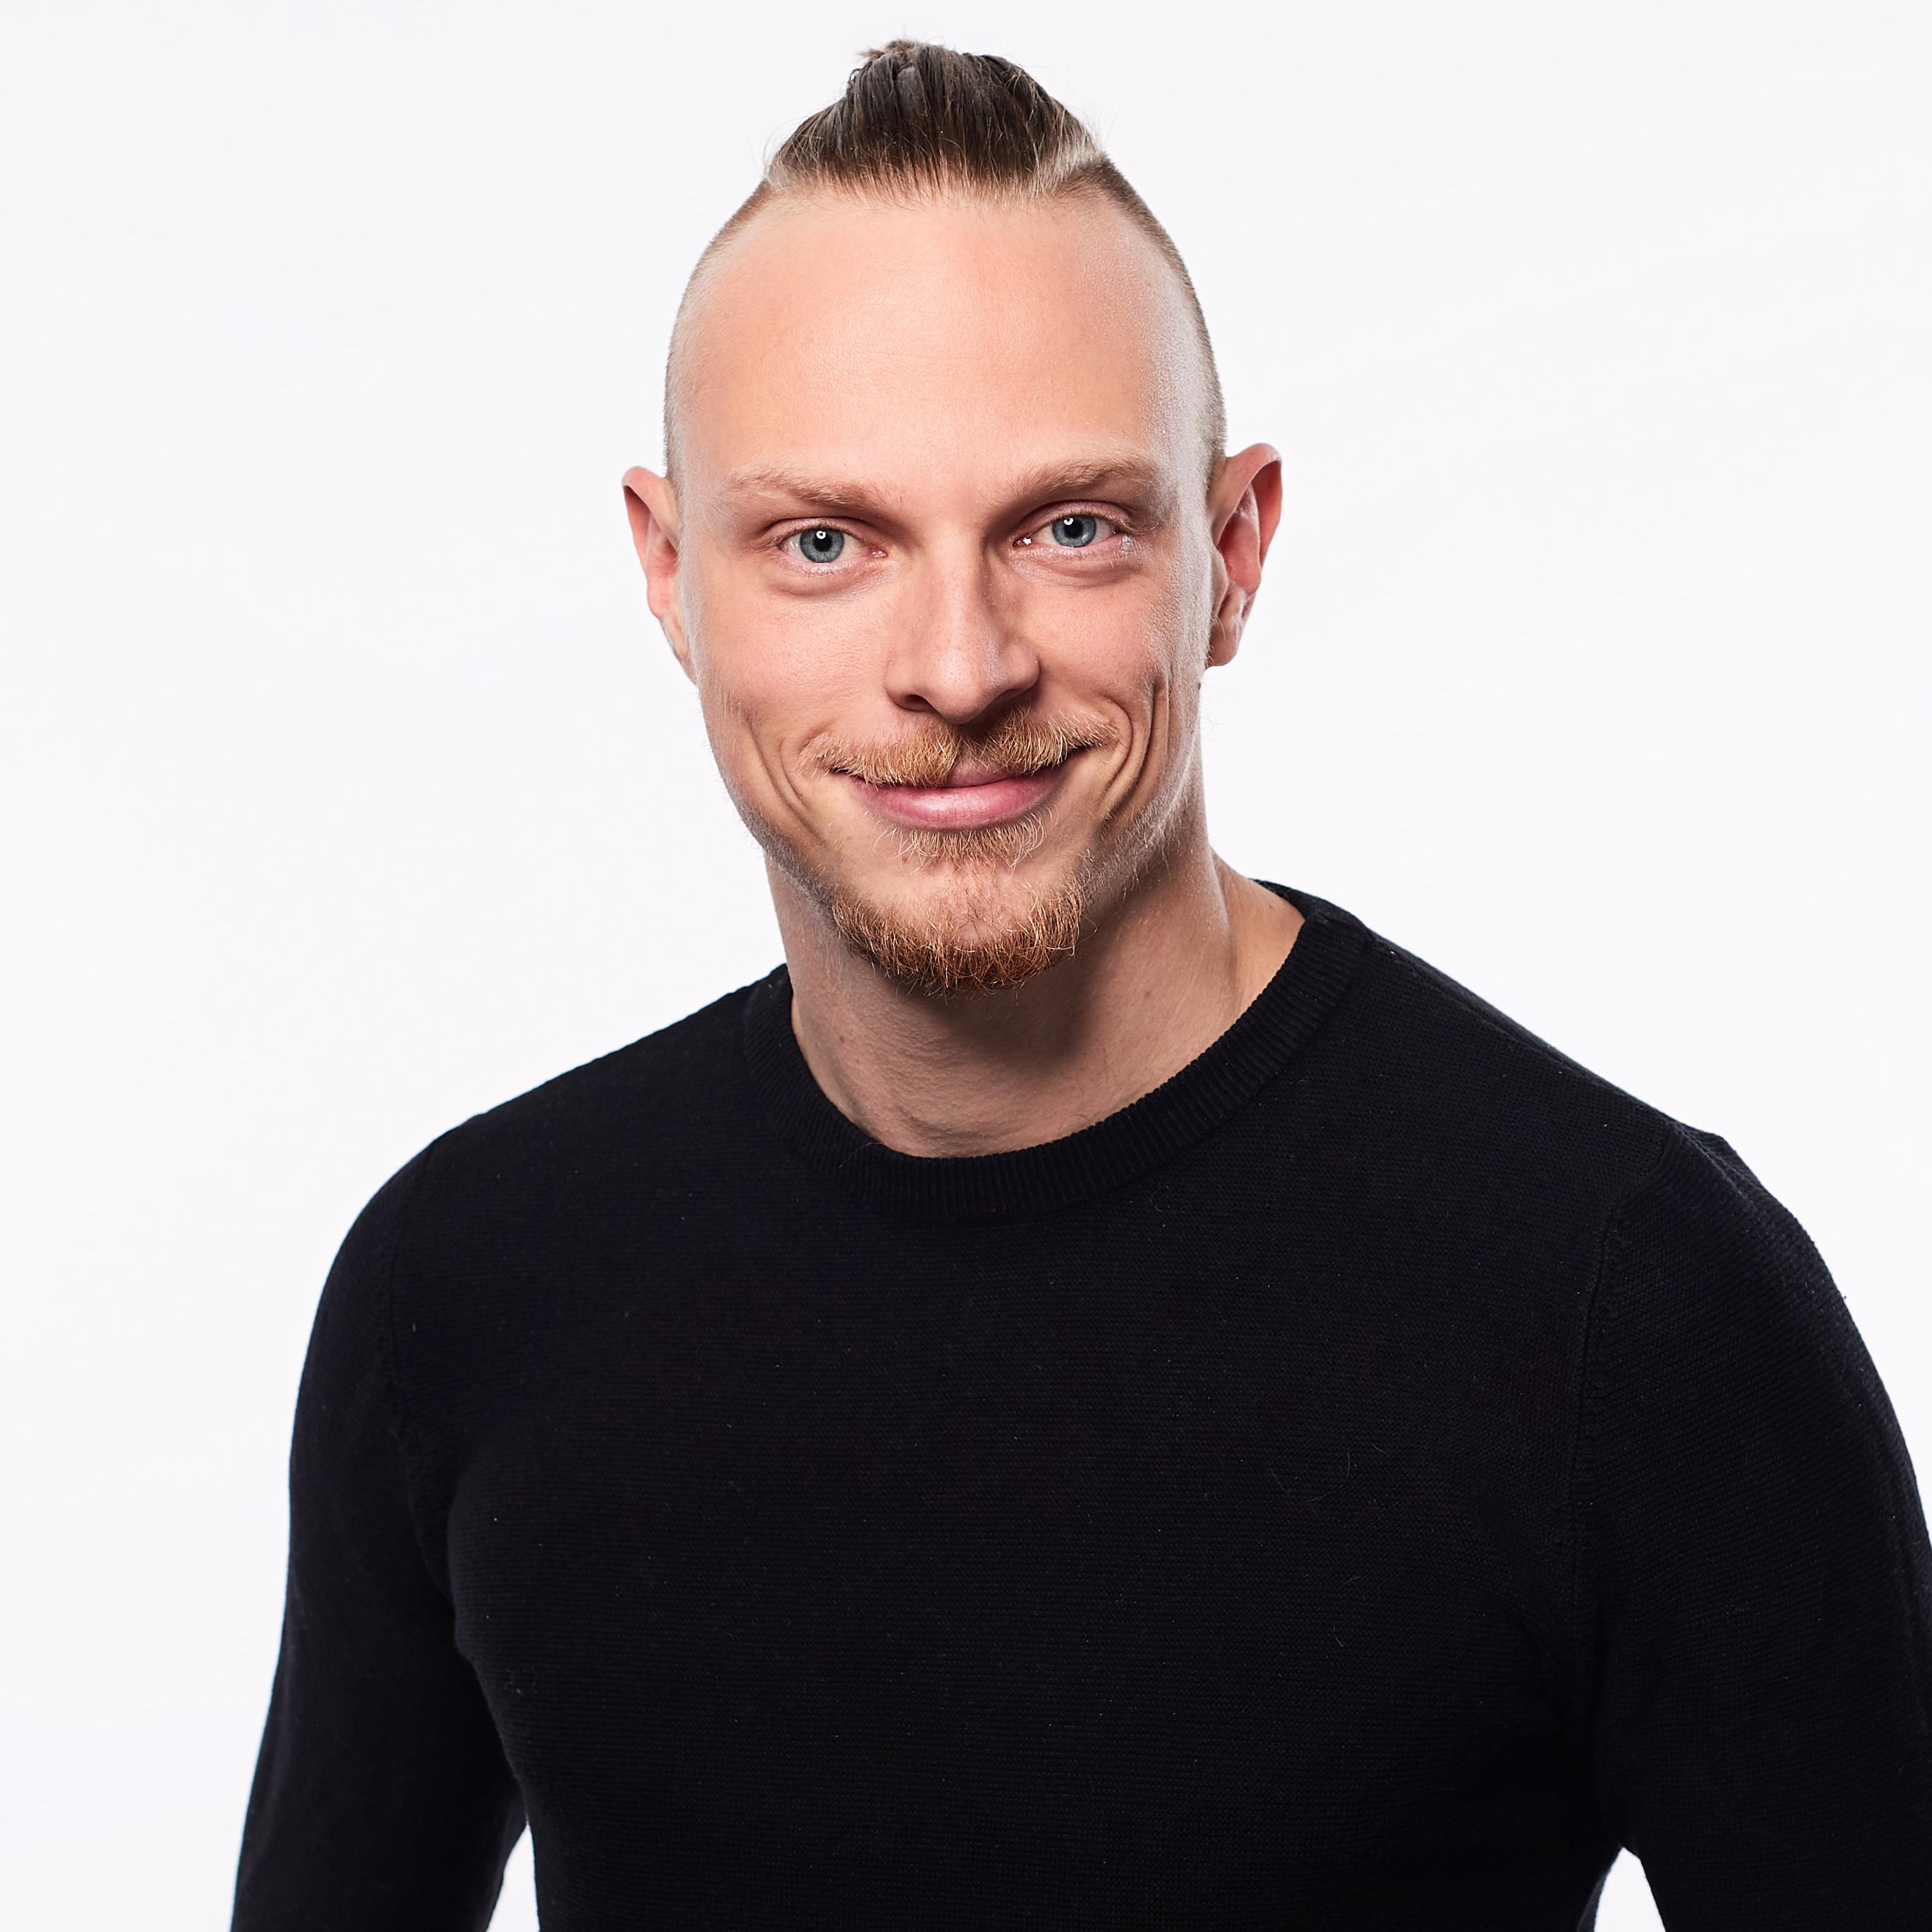 Christoph Schachner